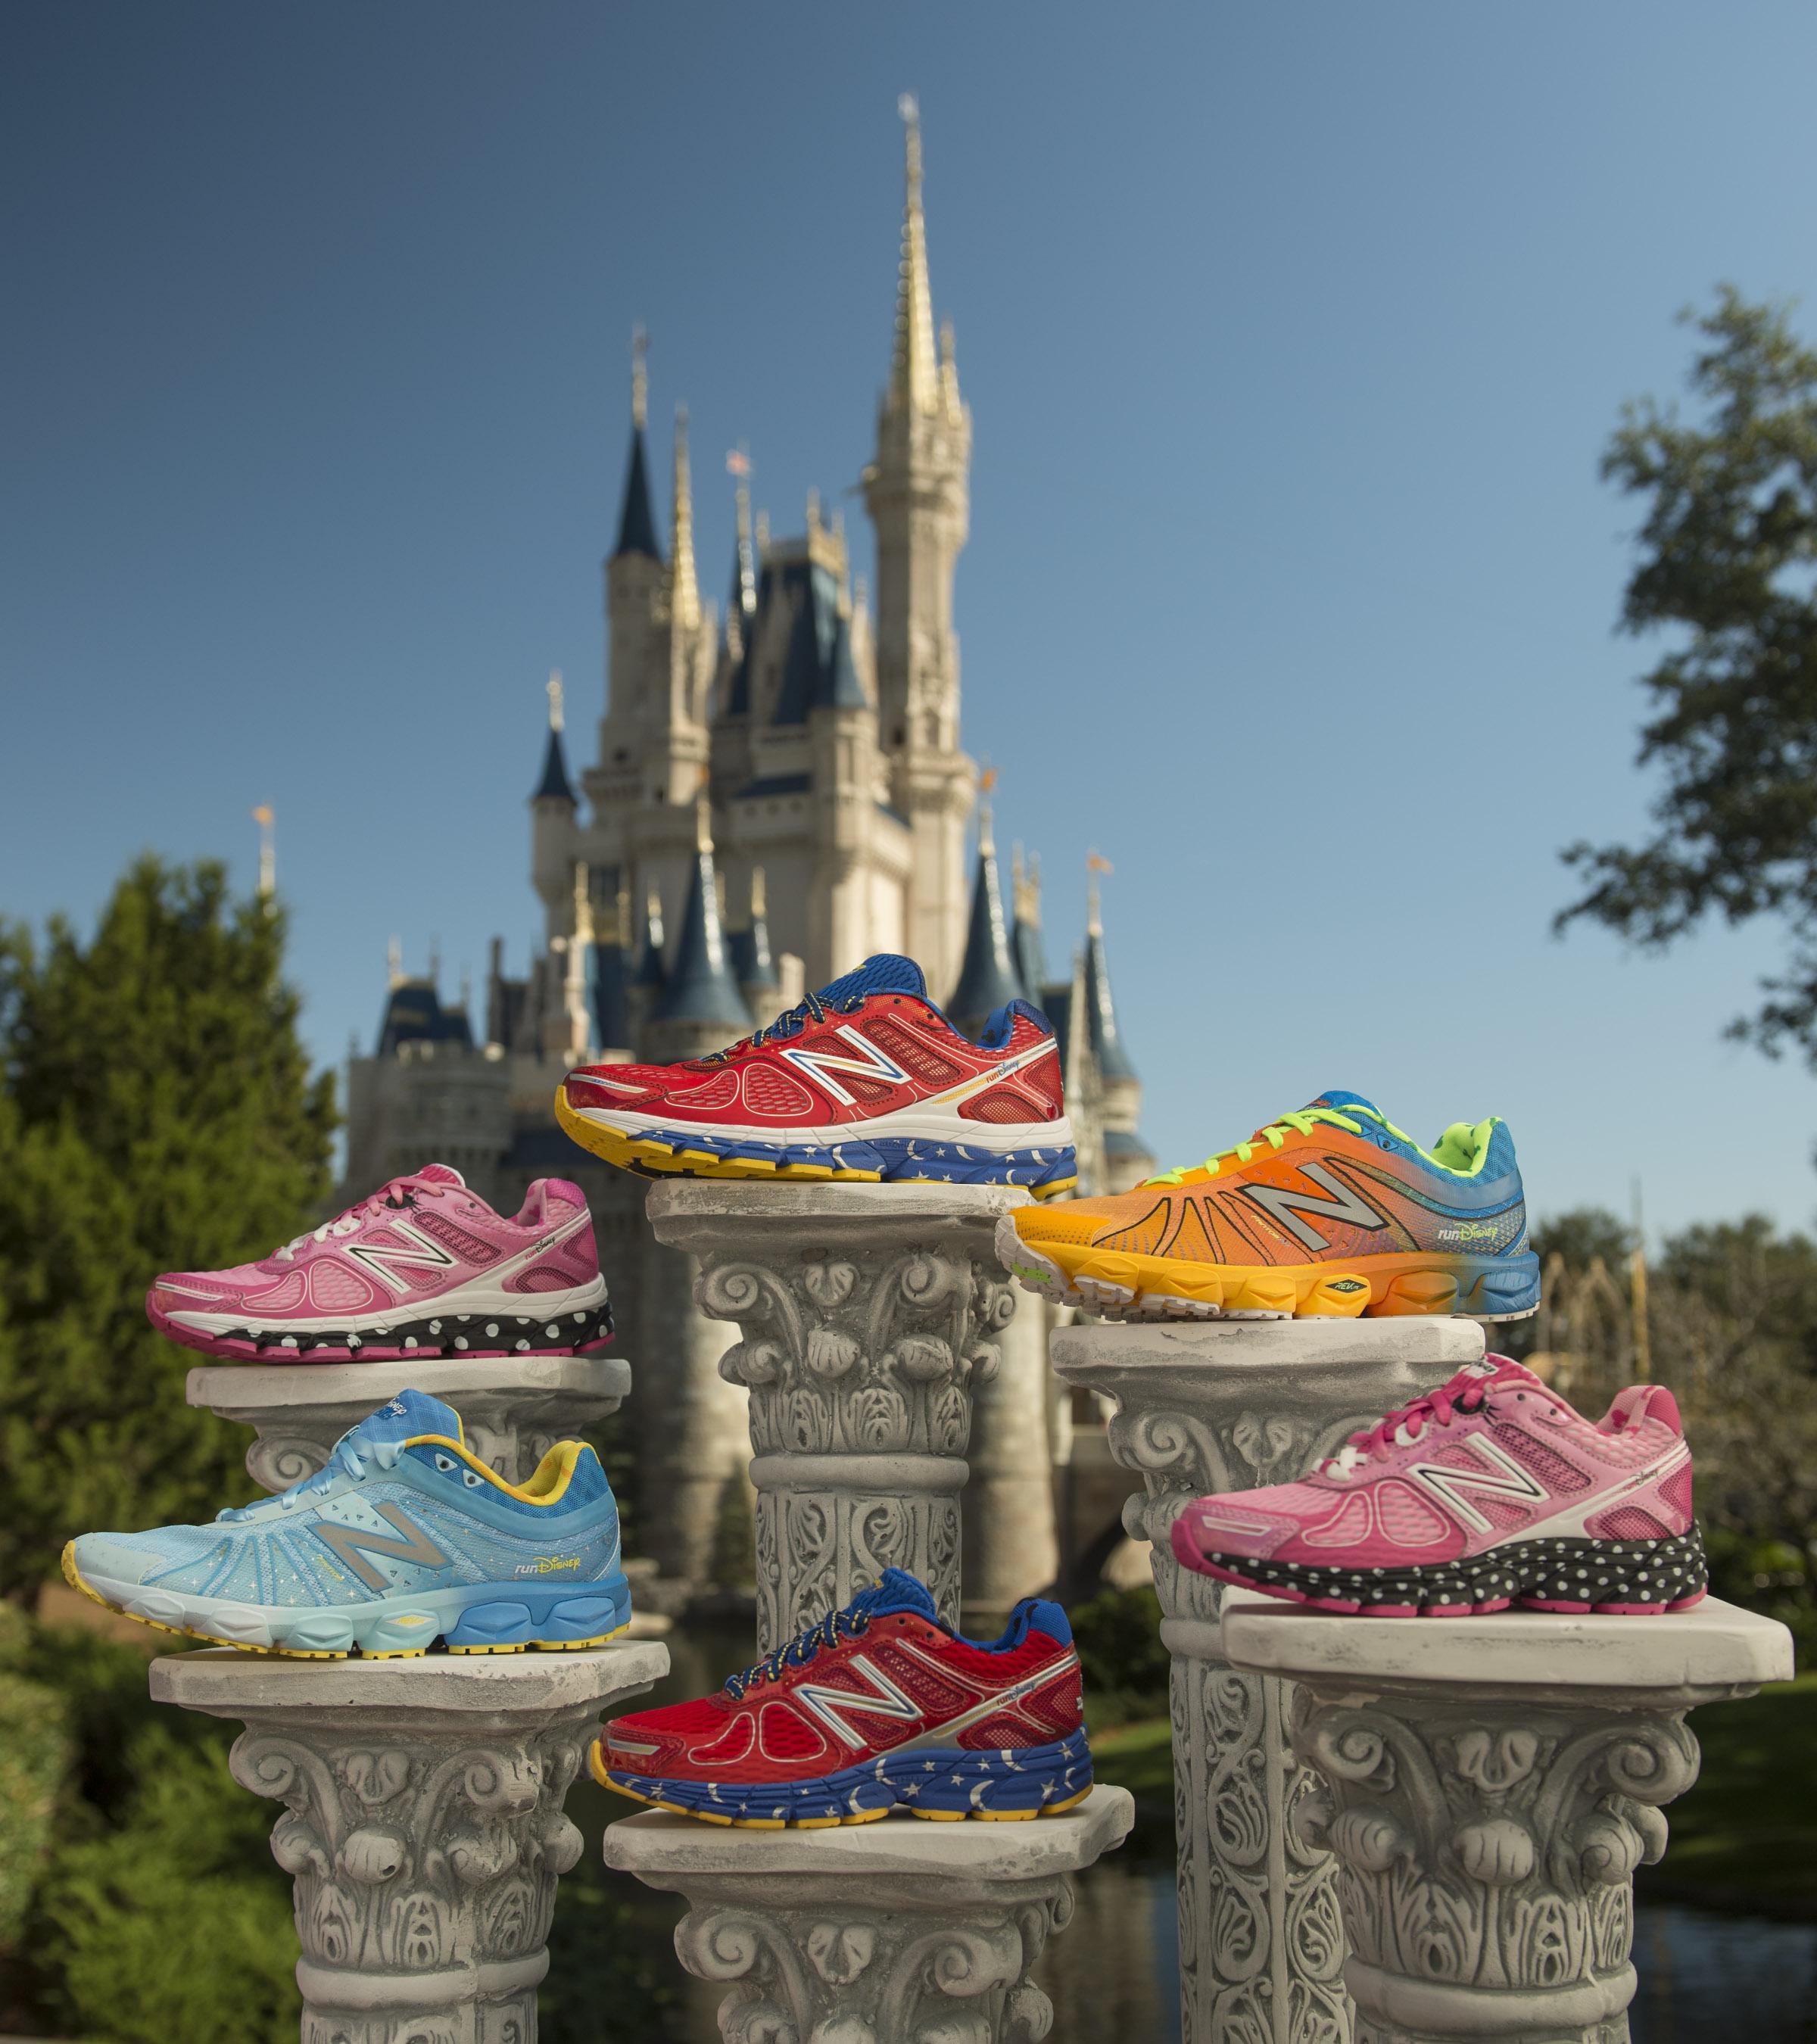 All-runDisney-shoes.jpg